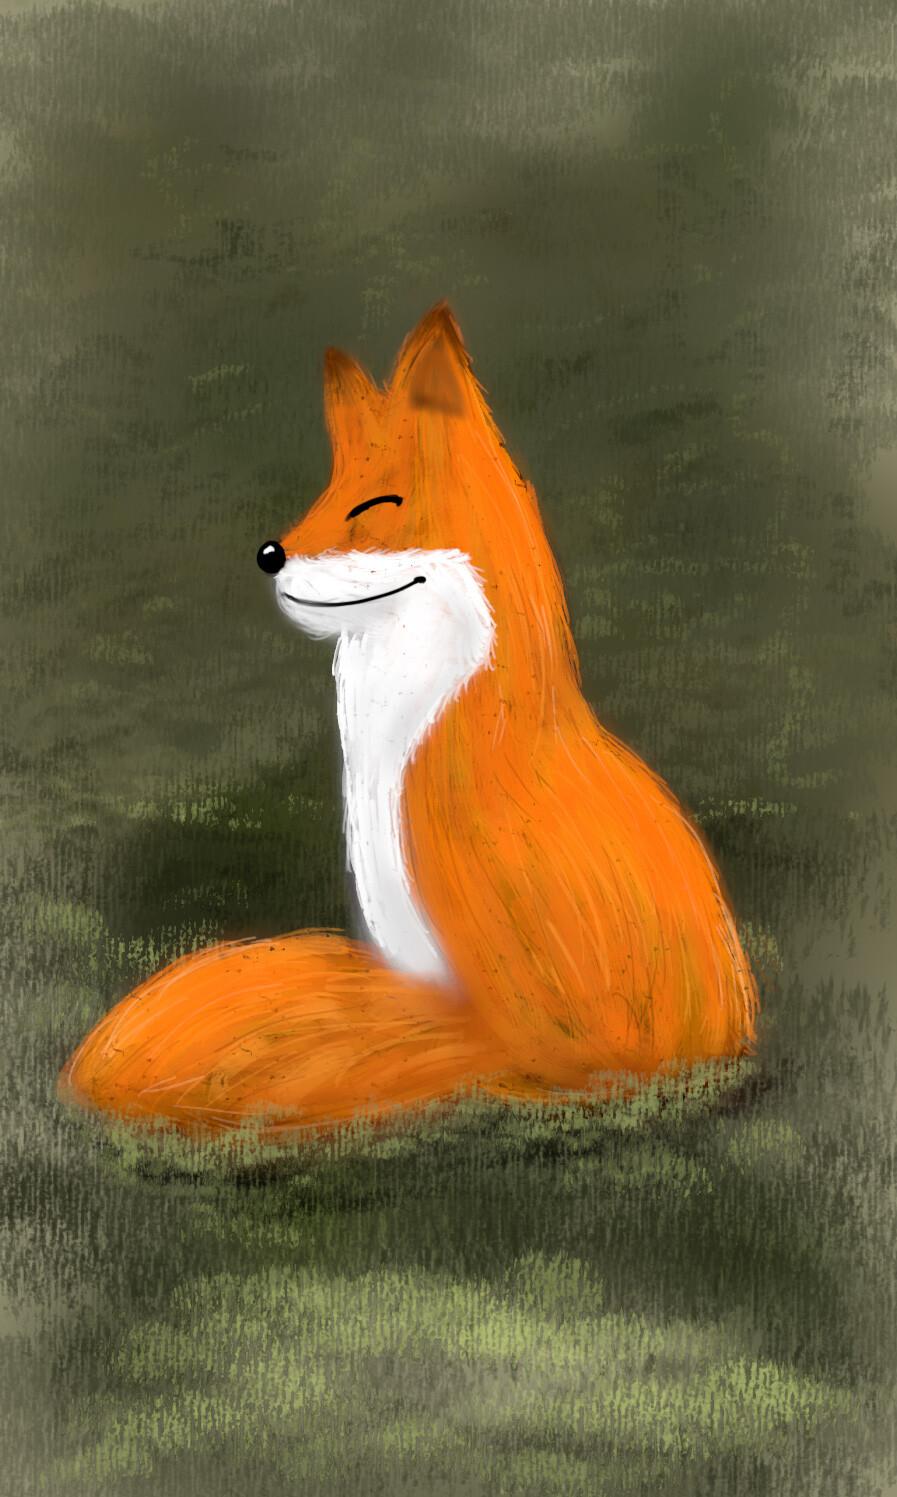 Le Renard The Fox